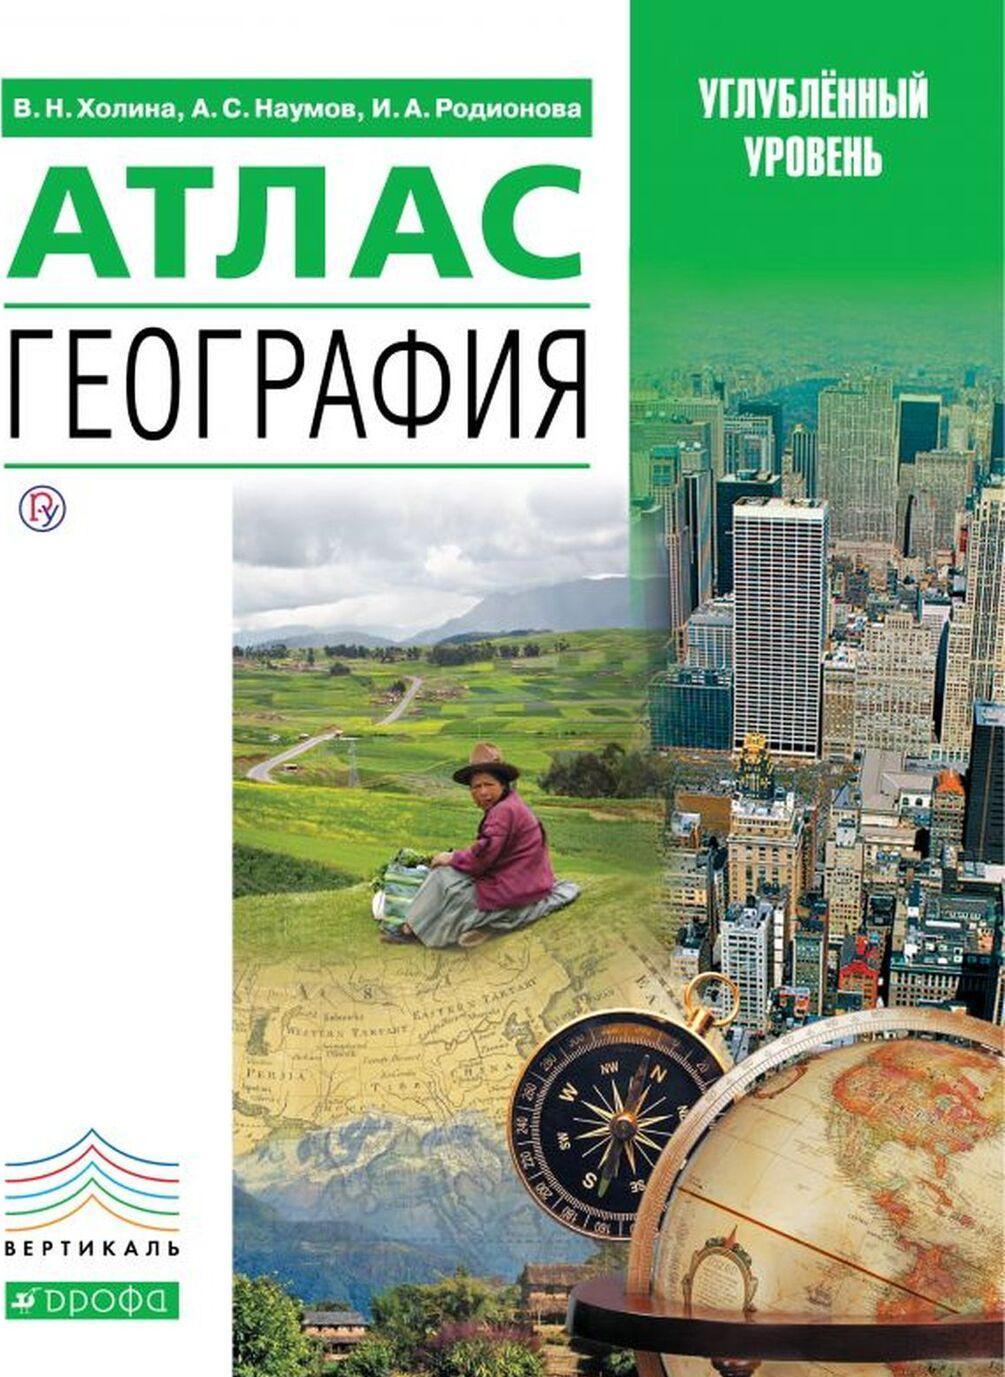 Geografija. Atlas